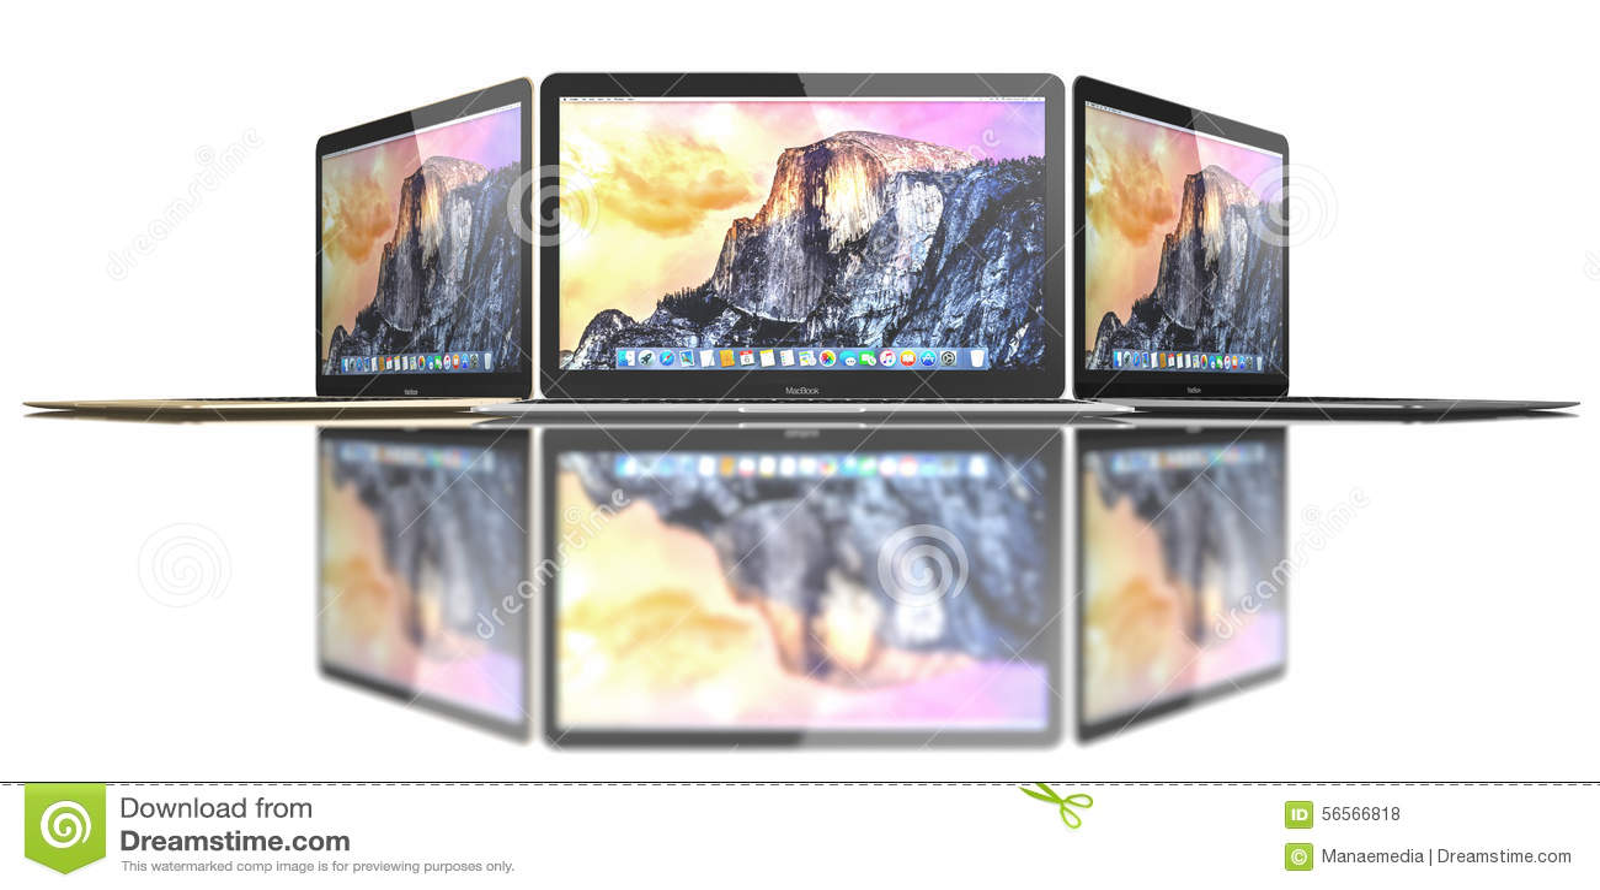 Download Νέος χρυσός, ασημένιος και διαστημικός γκρίζος αέρας MacBook Εκδοτική Στοκ Εικόνες - εικόνα από χρωματισμένος, κλάδων: 56566818